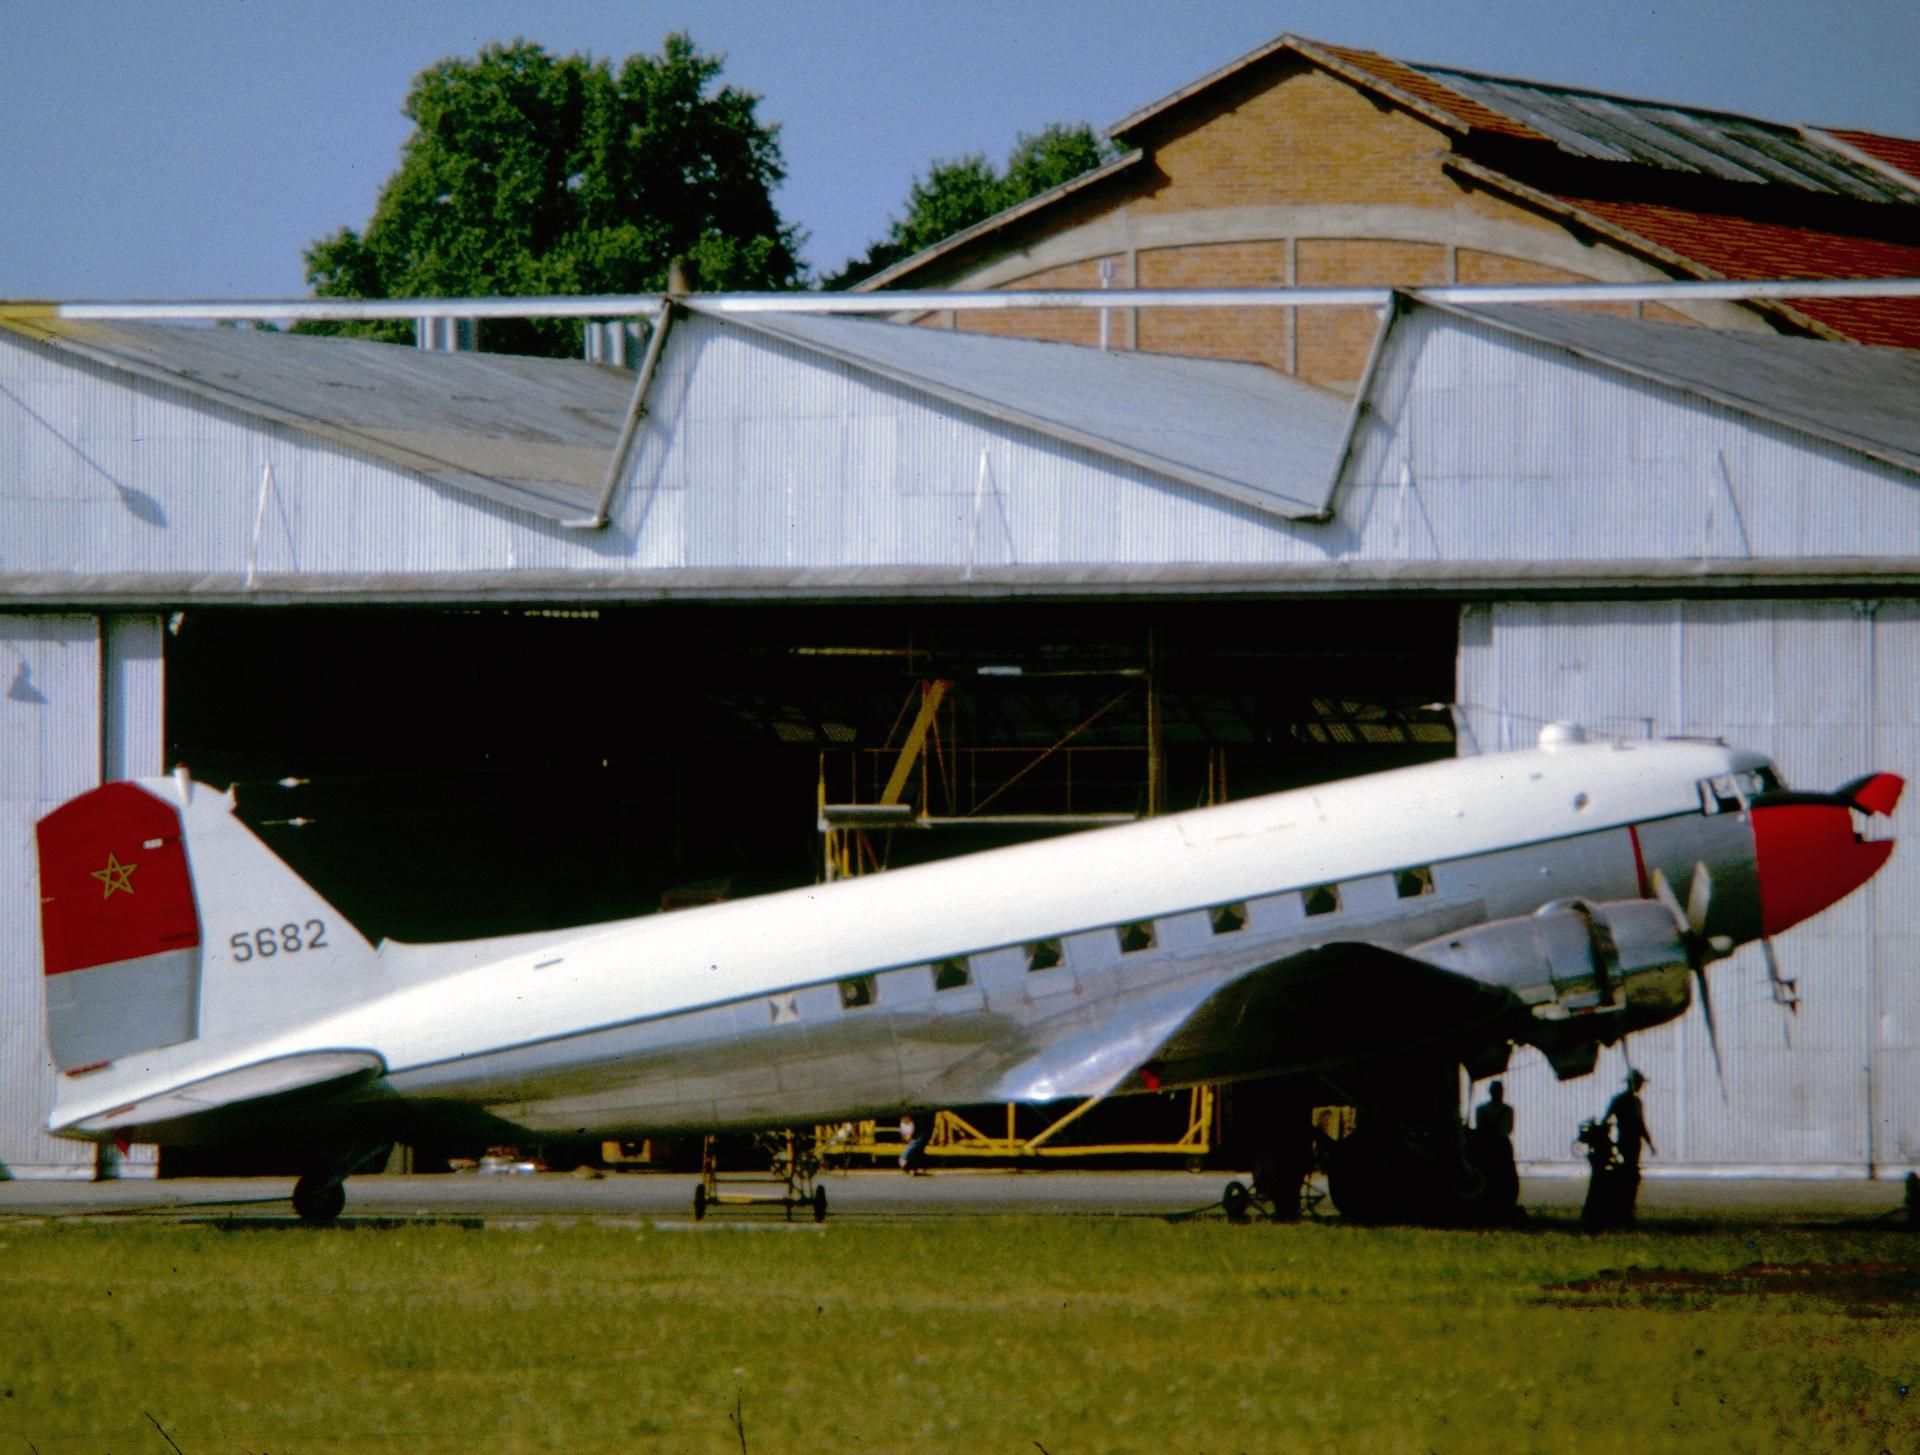 FRA: Photos anciens avions des FRA - Page 7 151220044012477768